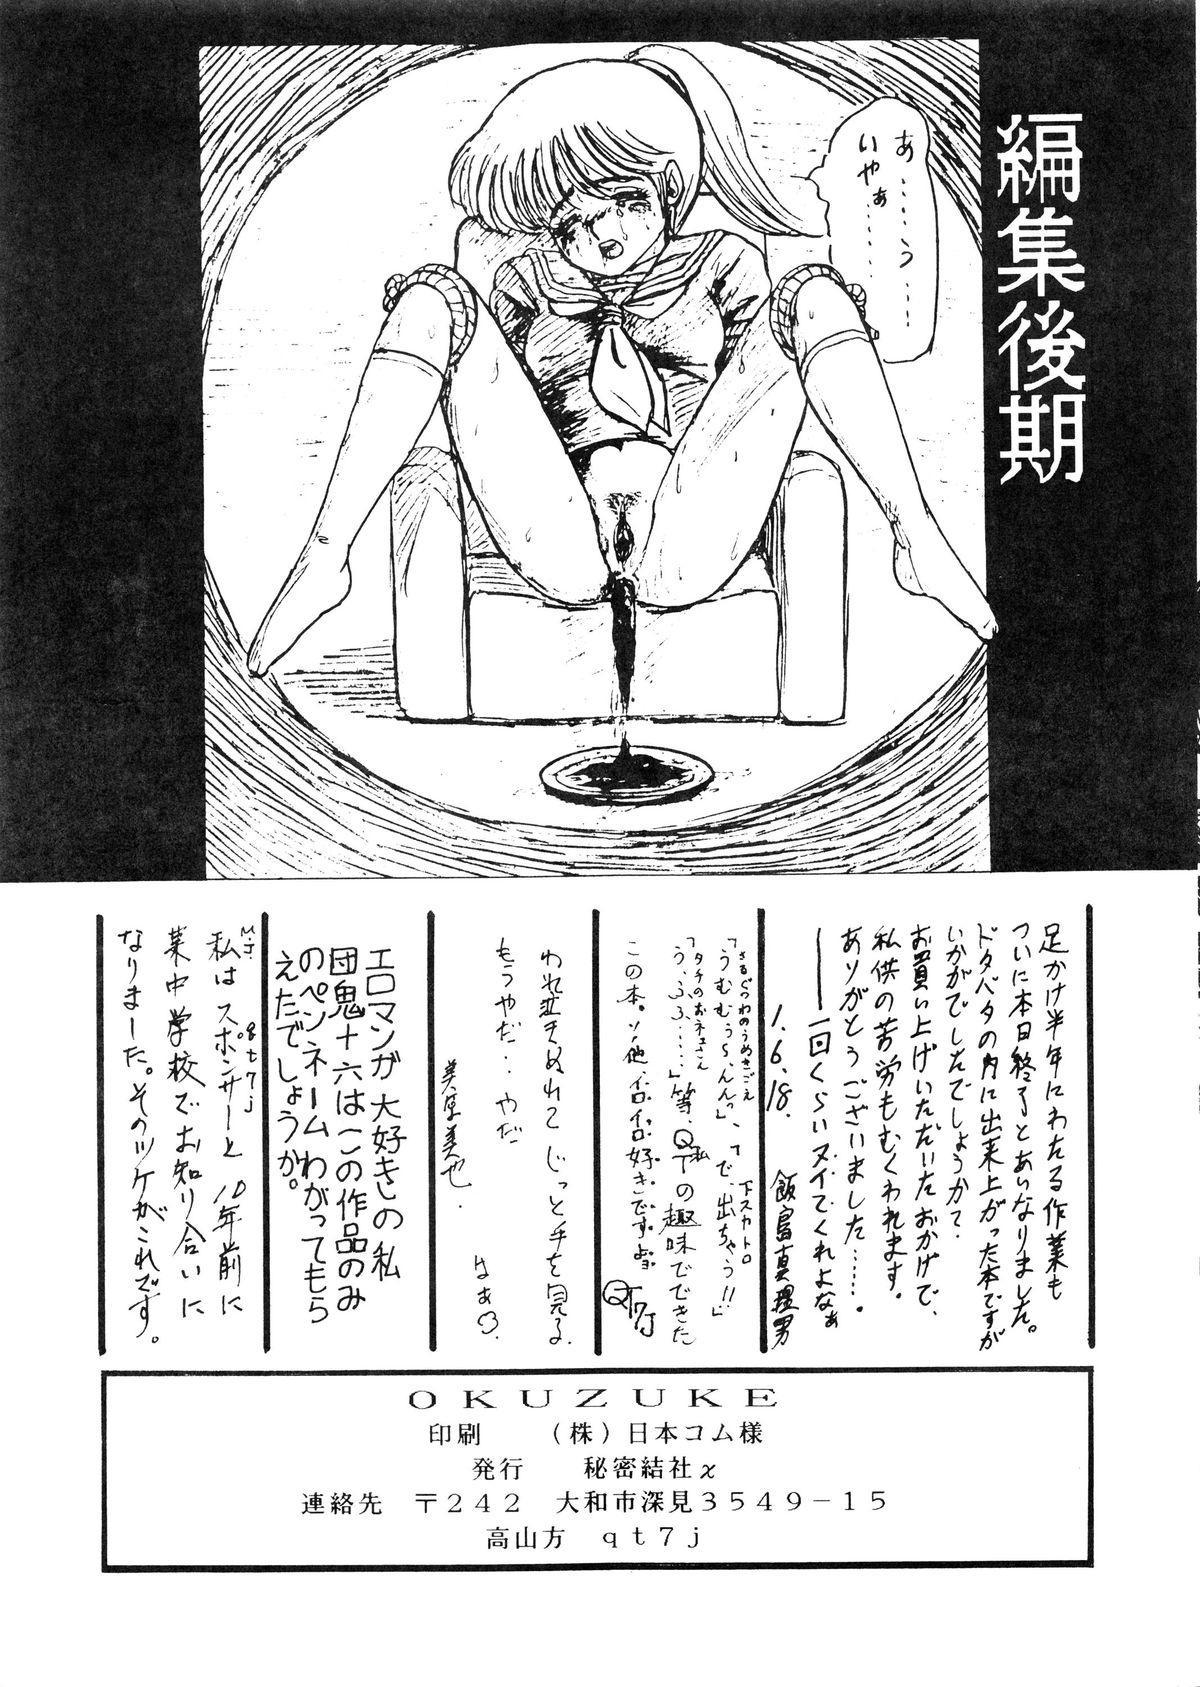 [Secret Society Chi (Iijima Mario)] Kai II - Iijima Mario Kojin-shi - (Various) 49